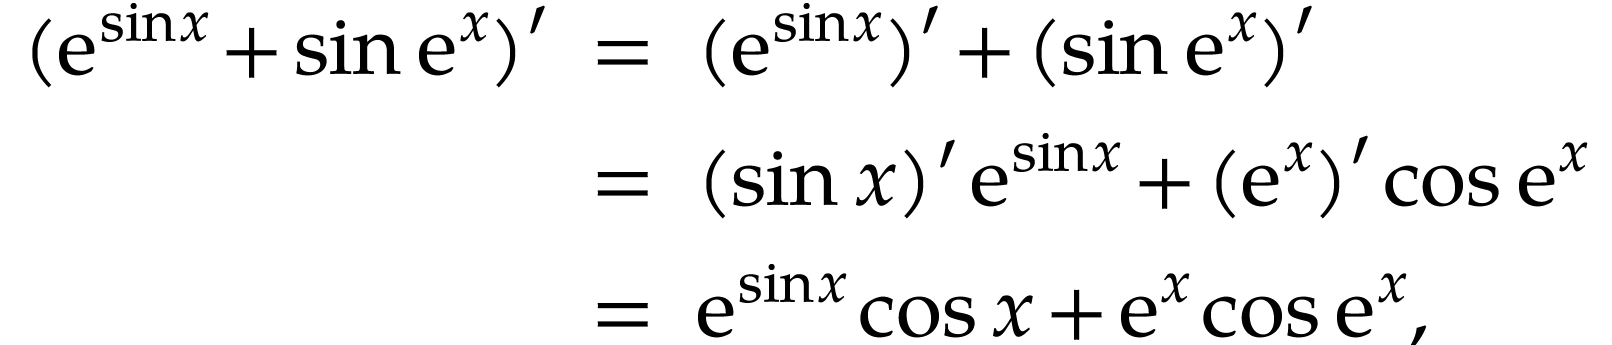 Mathematical formulas (FSF GNU project)